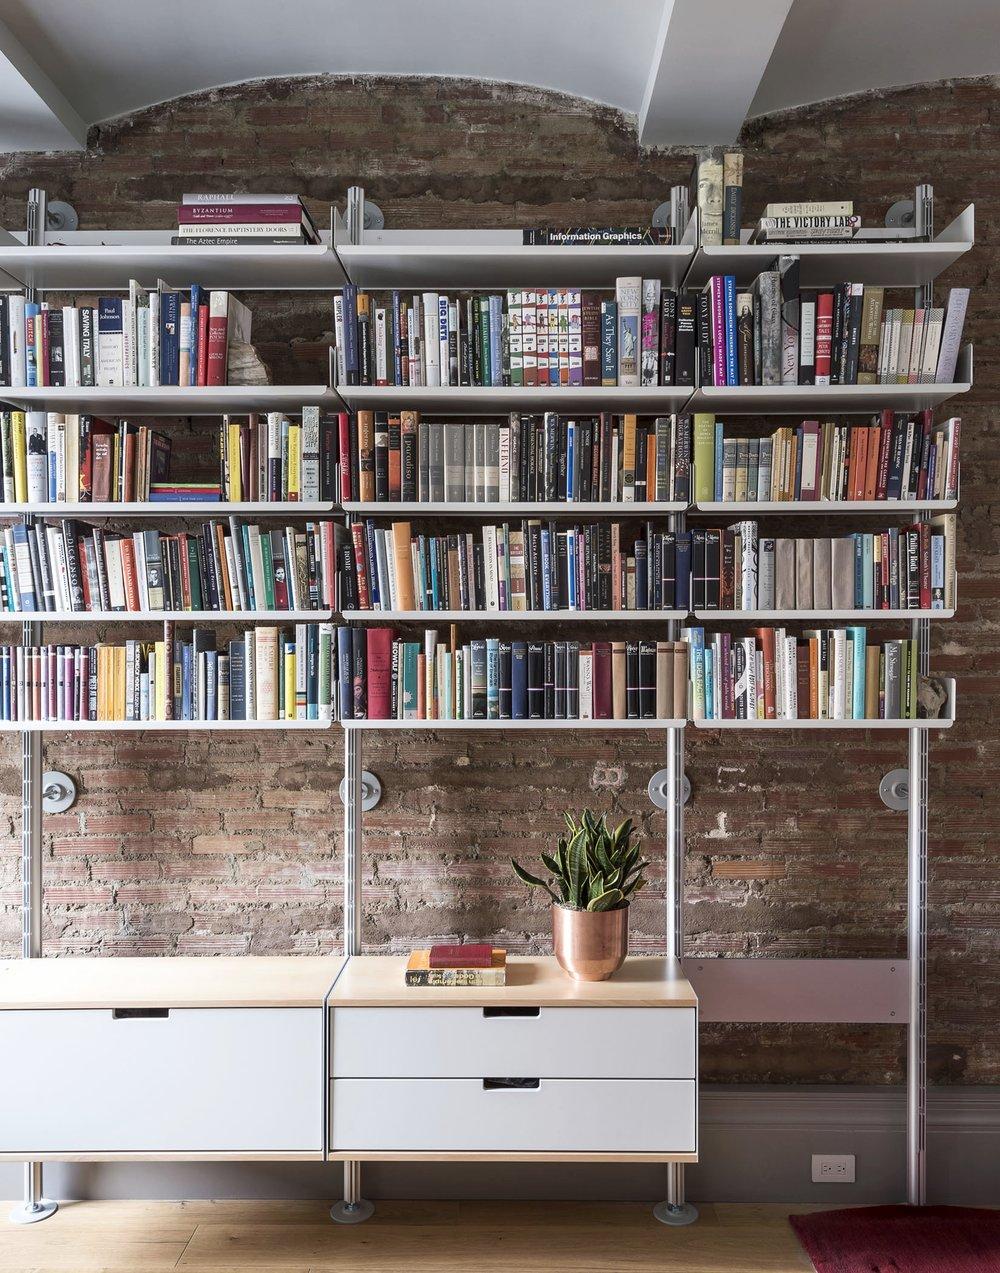 12th Street Loft Master Bedroom Bookshelf